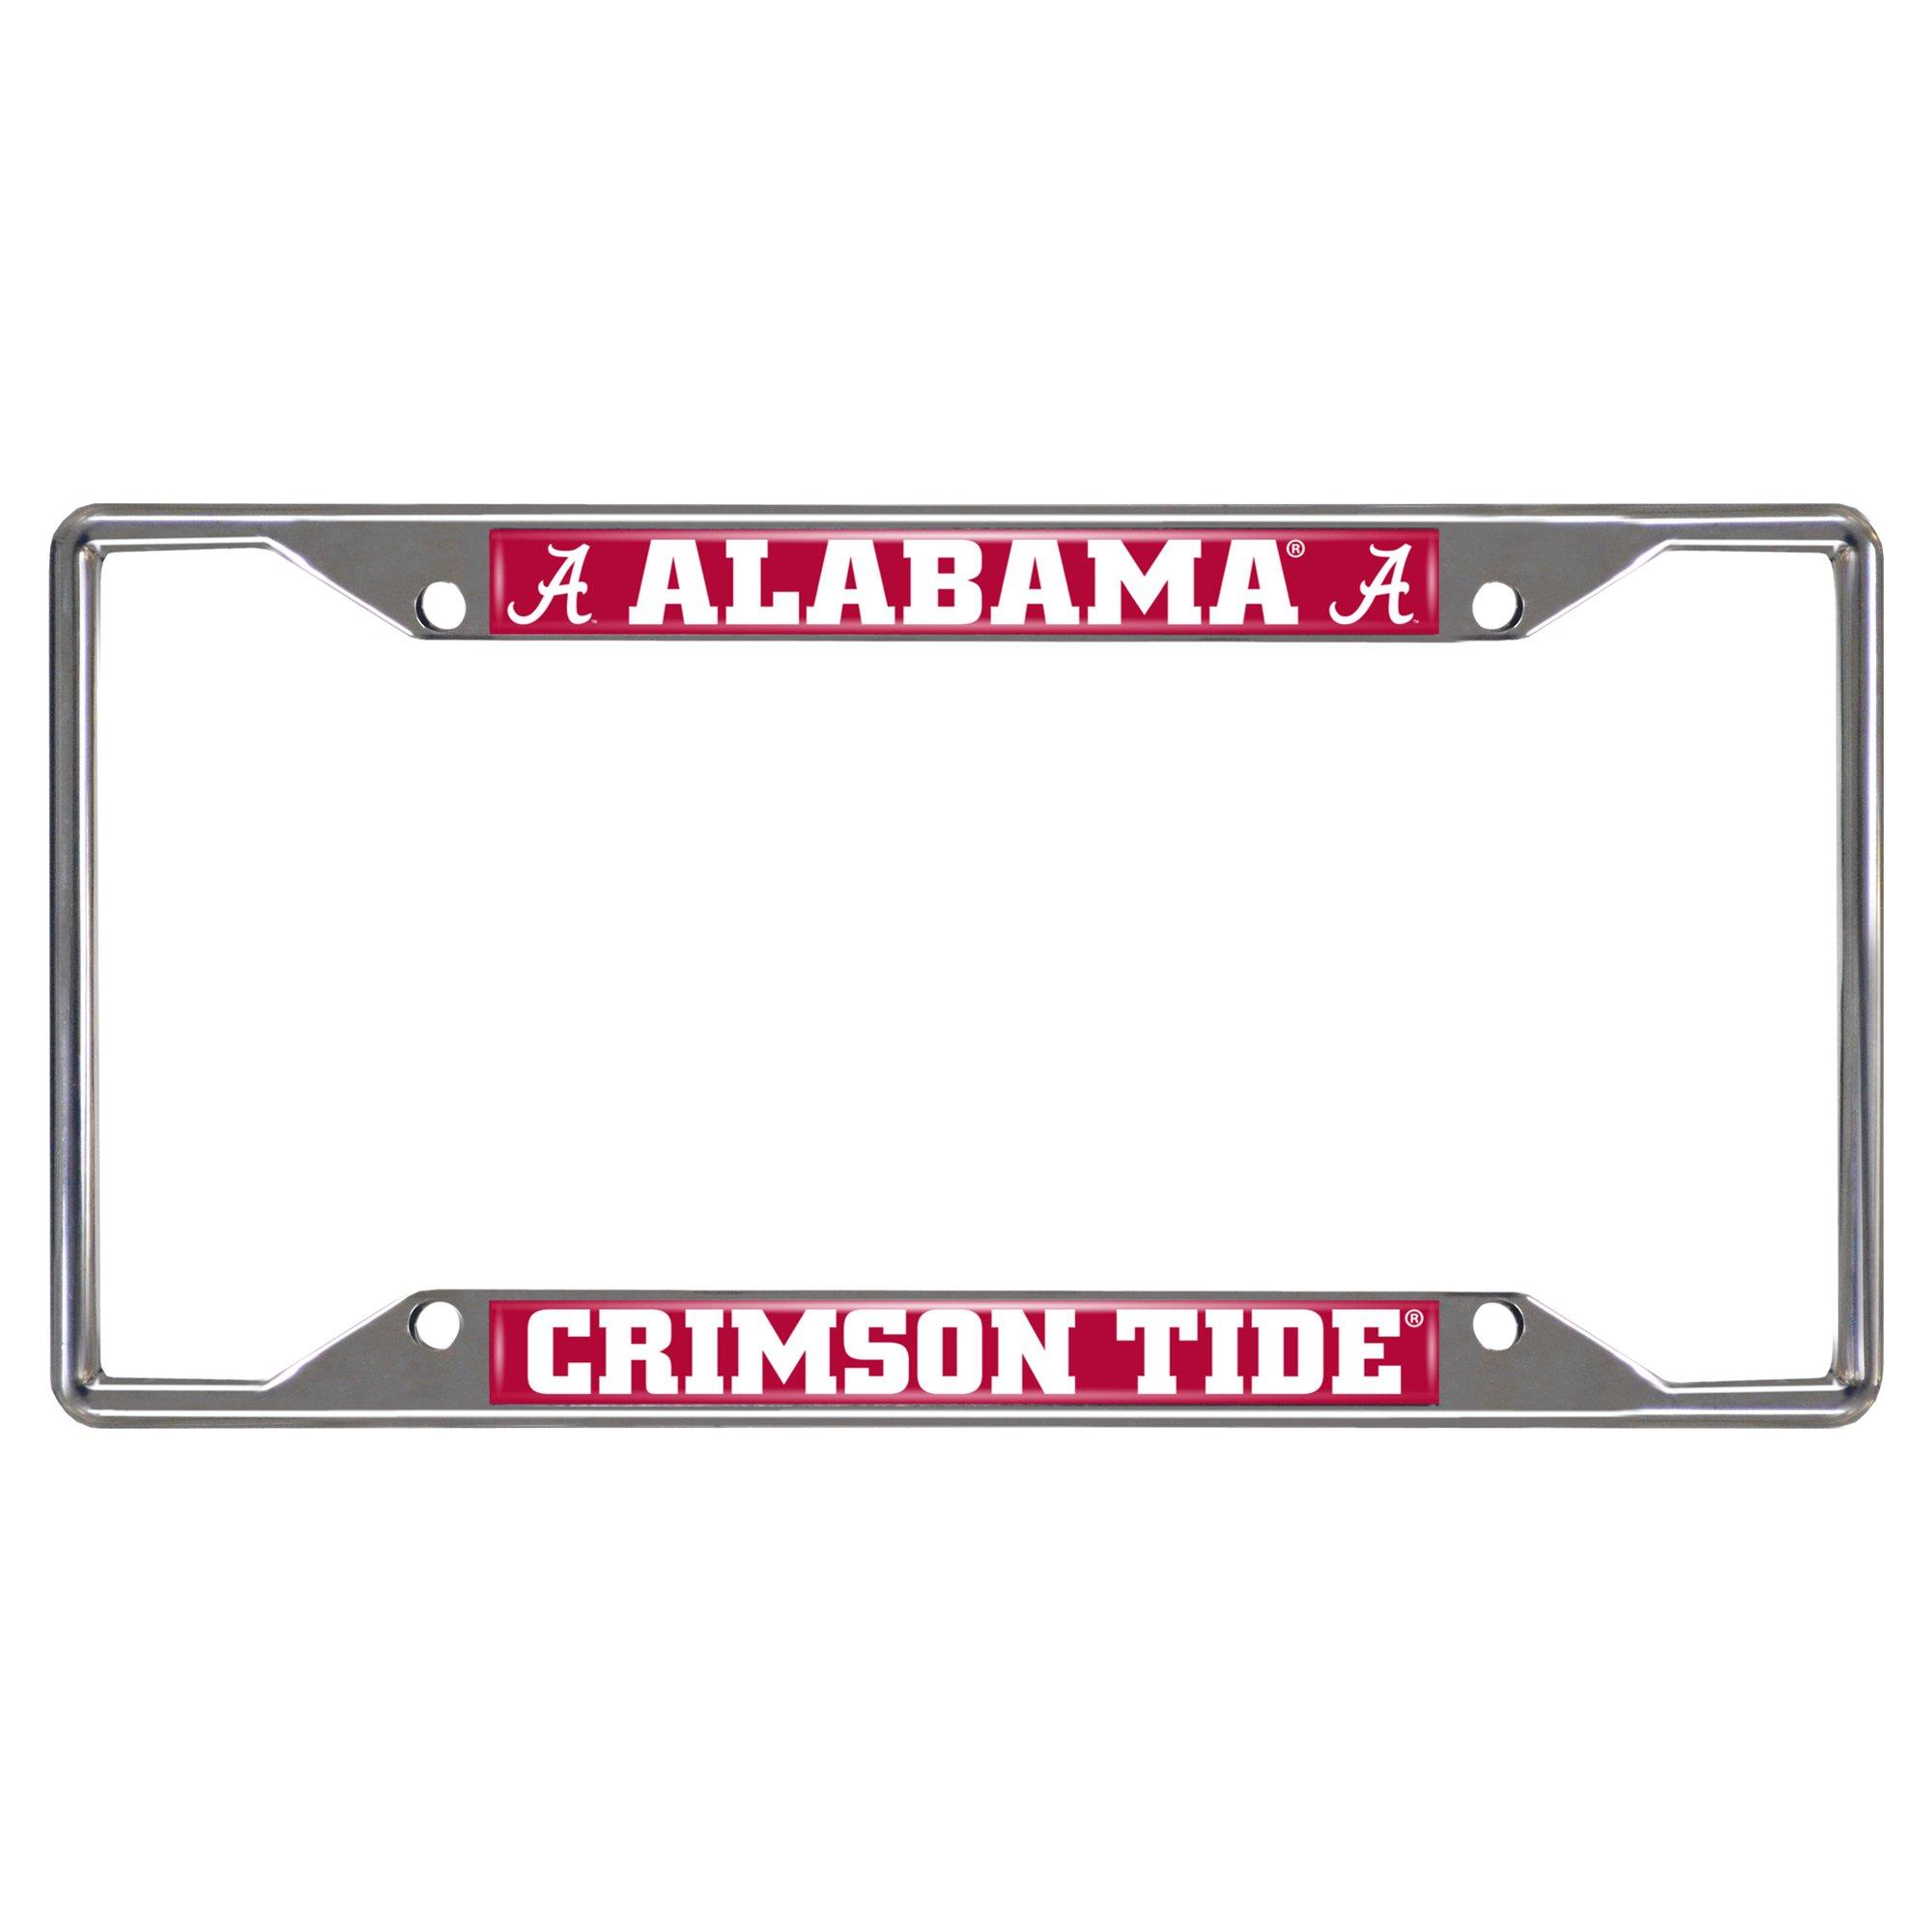 Fanmats NCAA University of Alabama Crimson Tide Chrome License Plate Frame